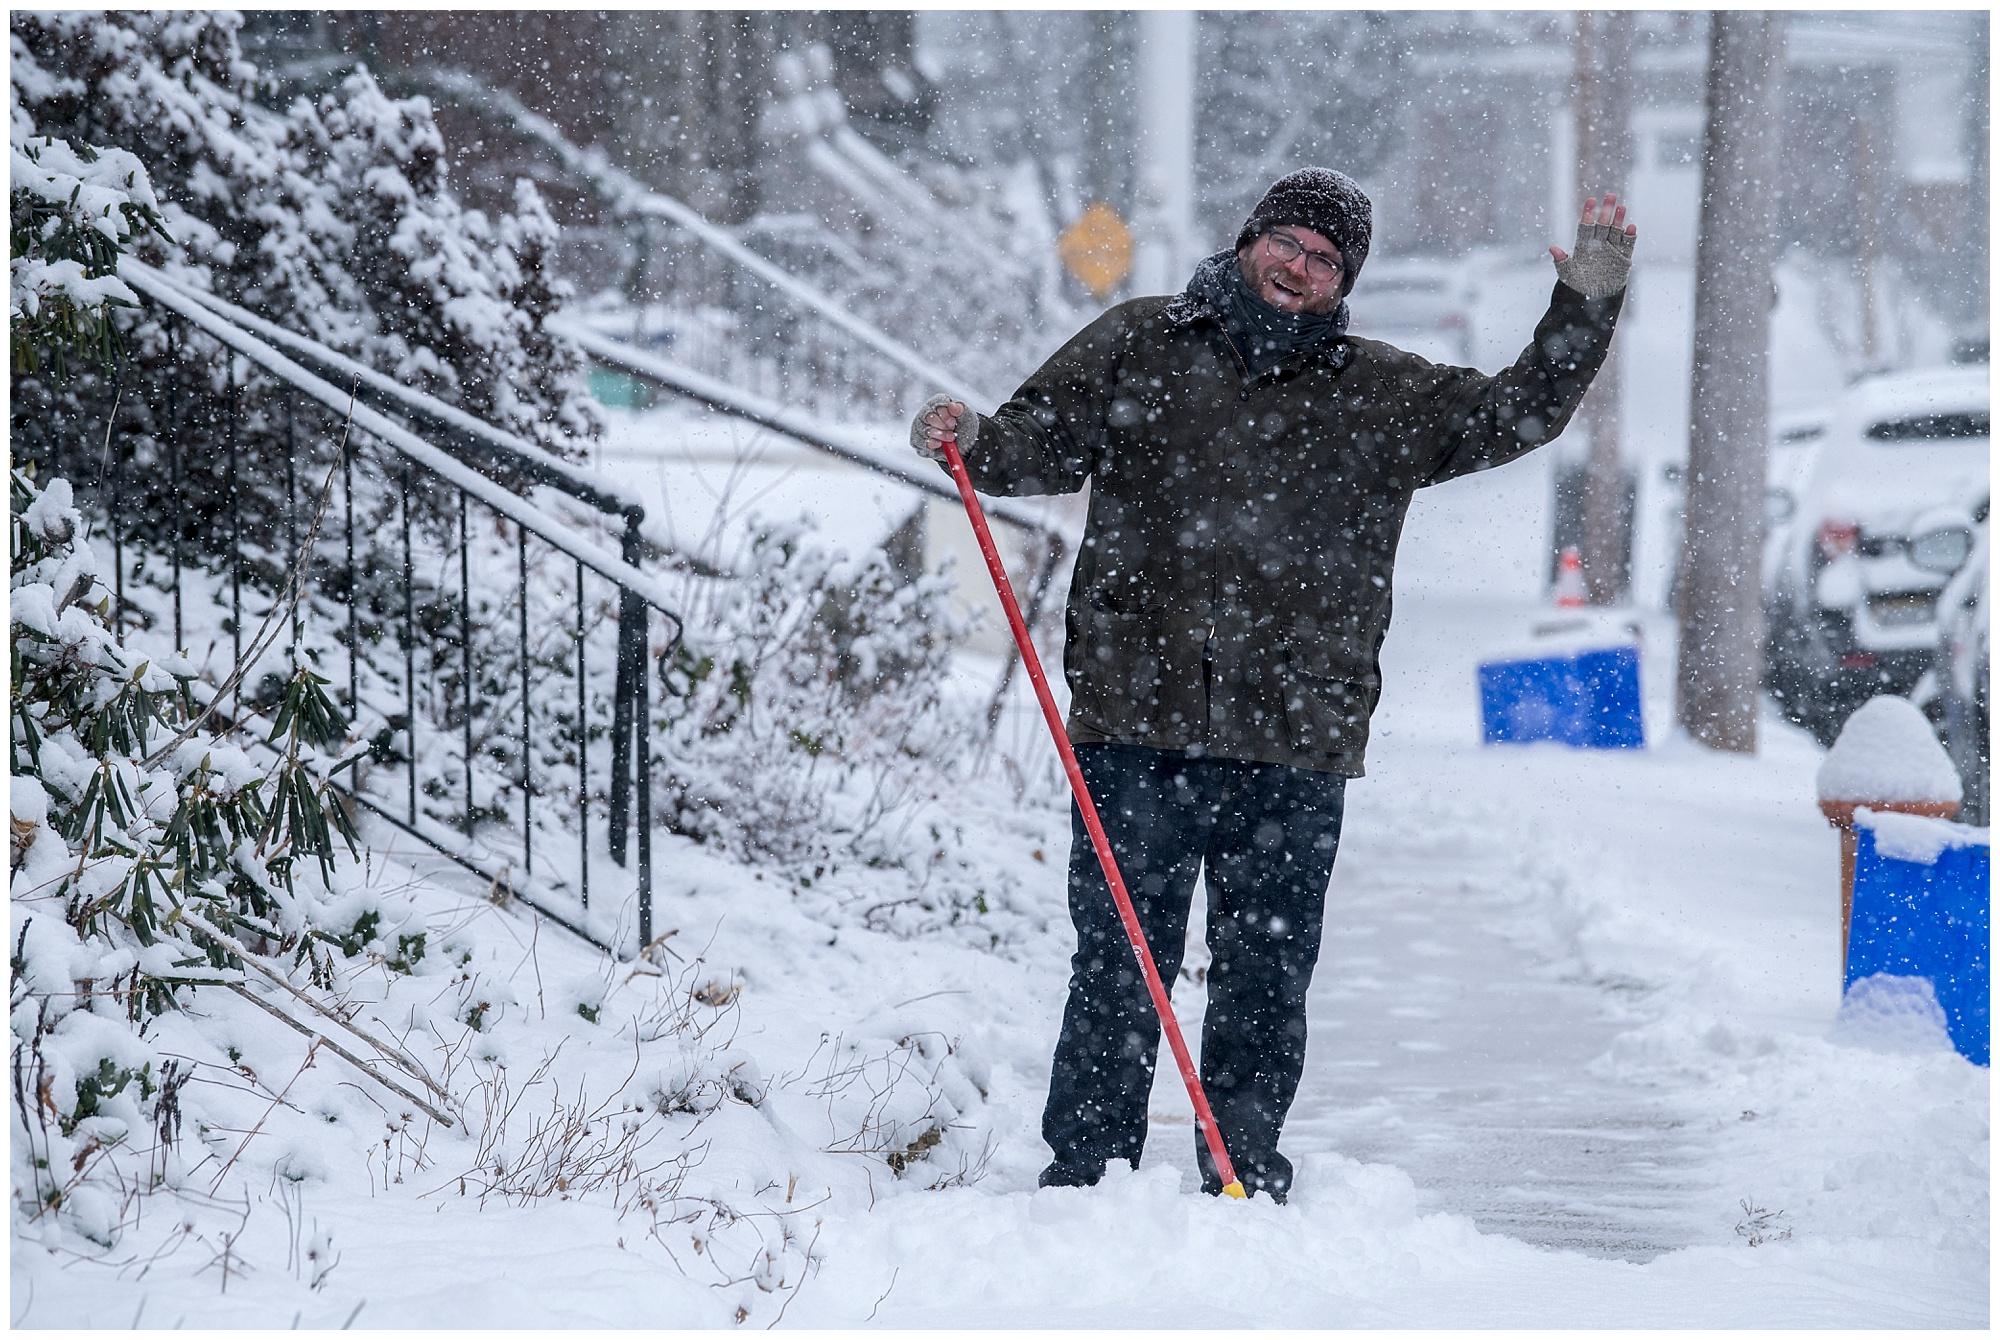 KielinskiPhotographers_snowday_2018-01-01_0010.jpg